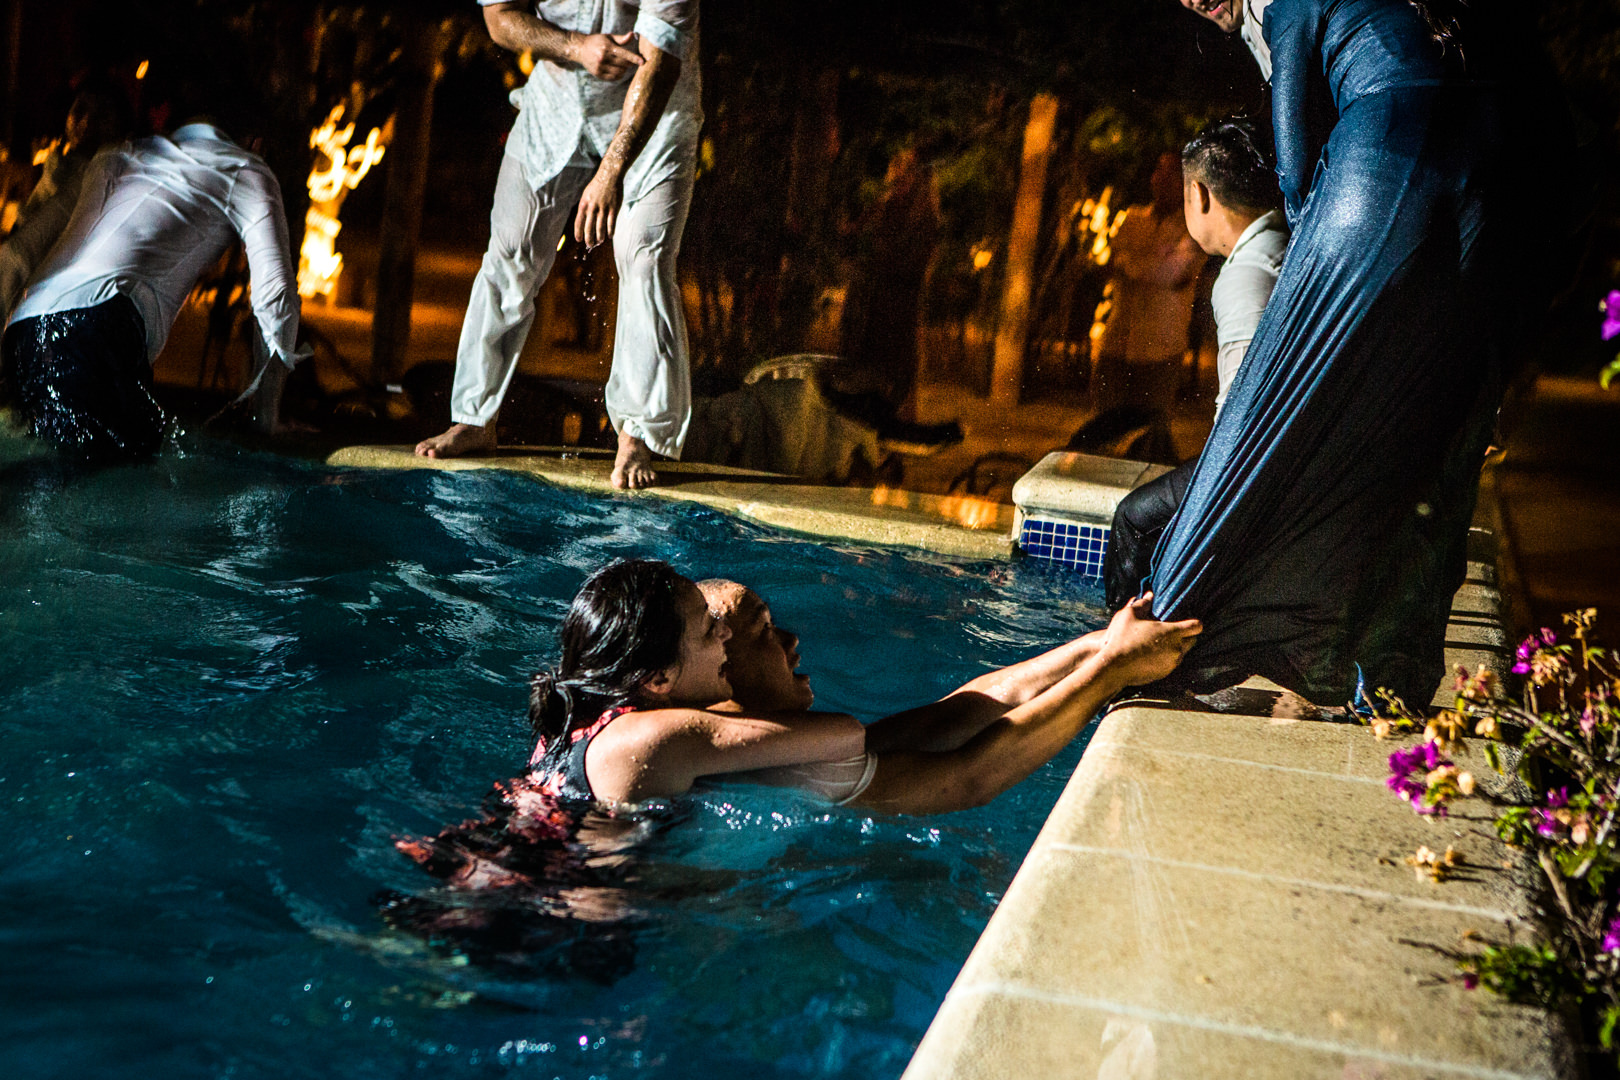 Boda-Hacienda-San-Rafael-Sevilla-engagement-Rafael-Torres-fotografo-bodas-sevilla-madrid-barcelona-wedding-photographer--116.jpg